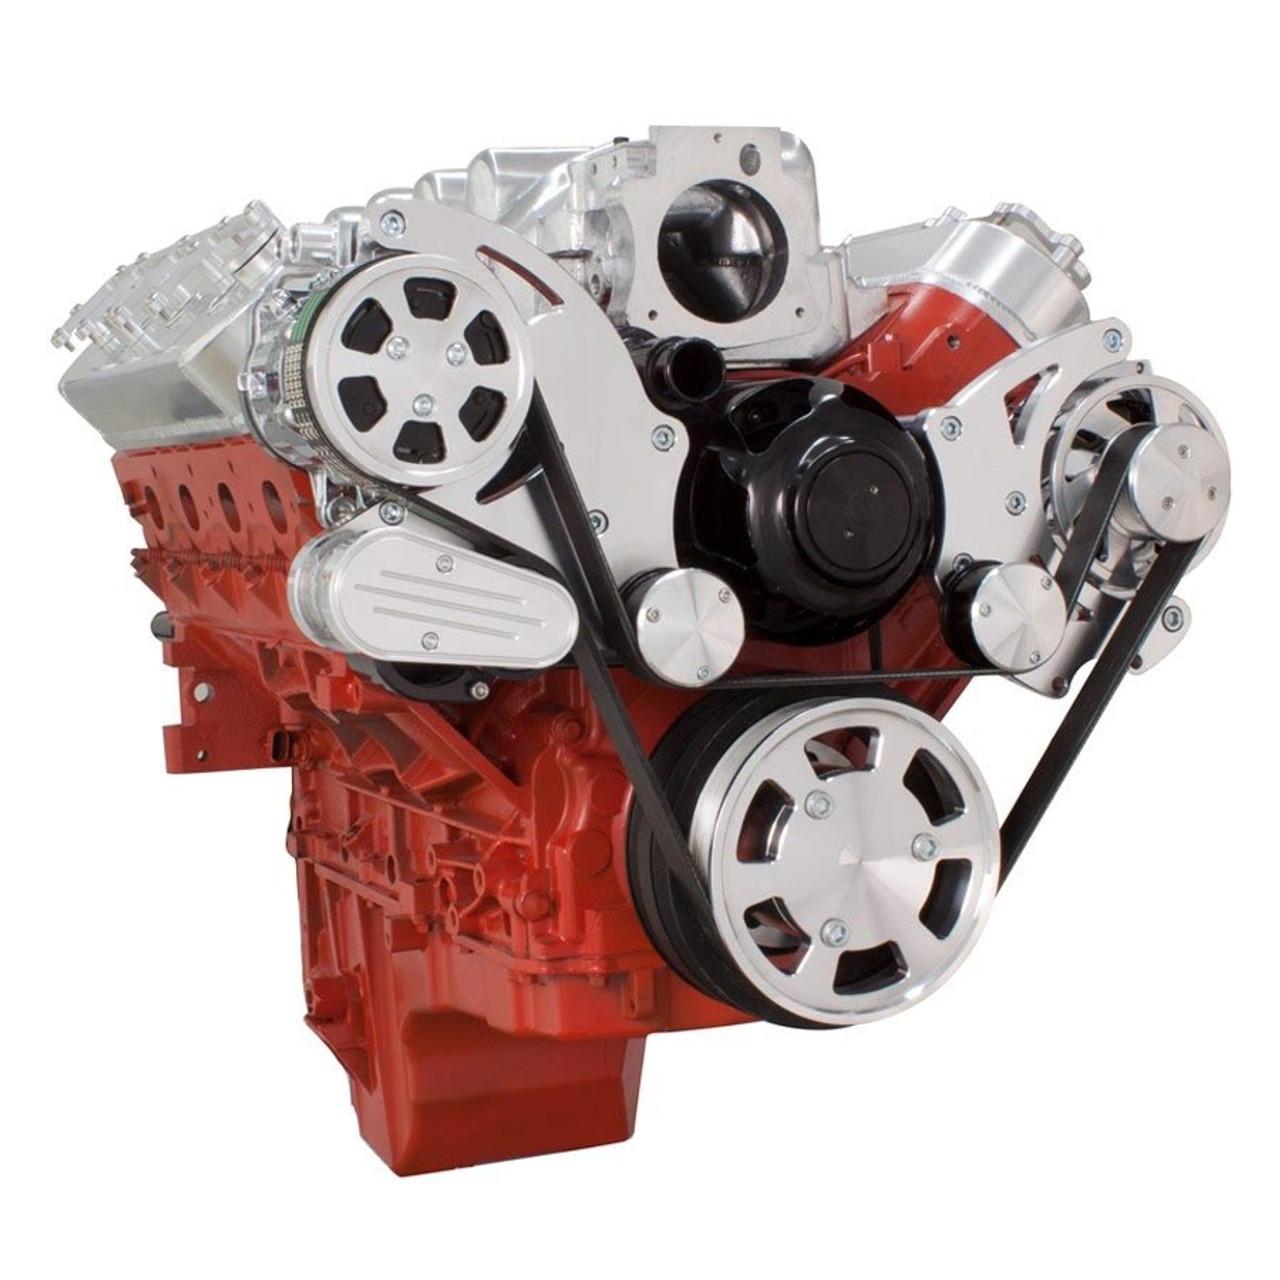 chevy ls serpentine kit ac alternator with electric water pump [ 900 x 900 Pixel ]